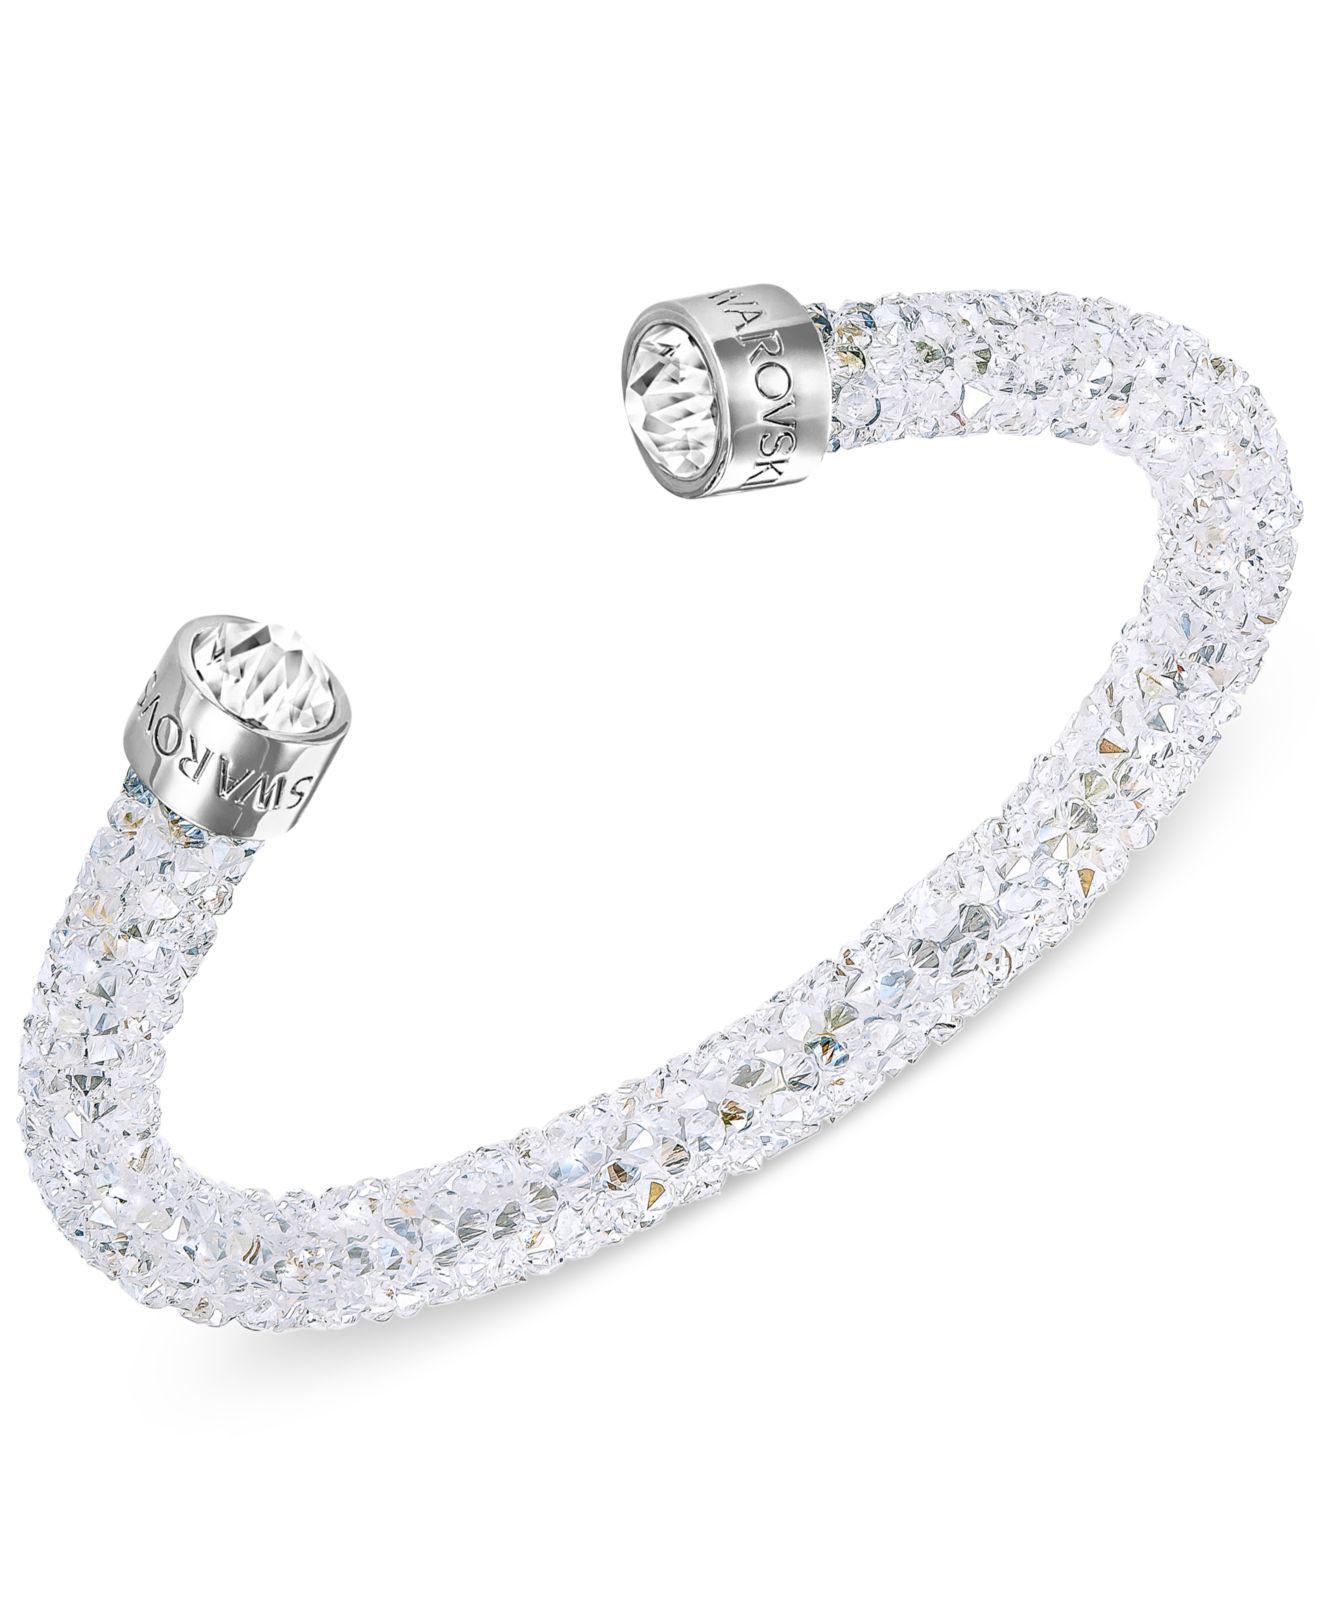 Silver-tone Black Crystal And Crystaldust Open Cuff Bracelet